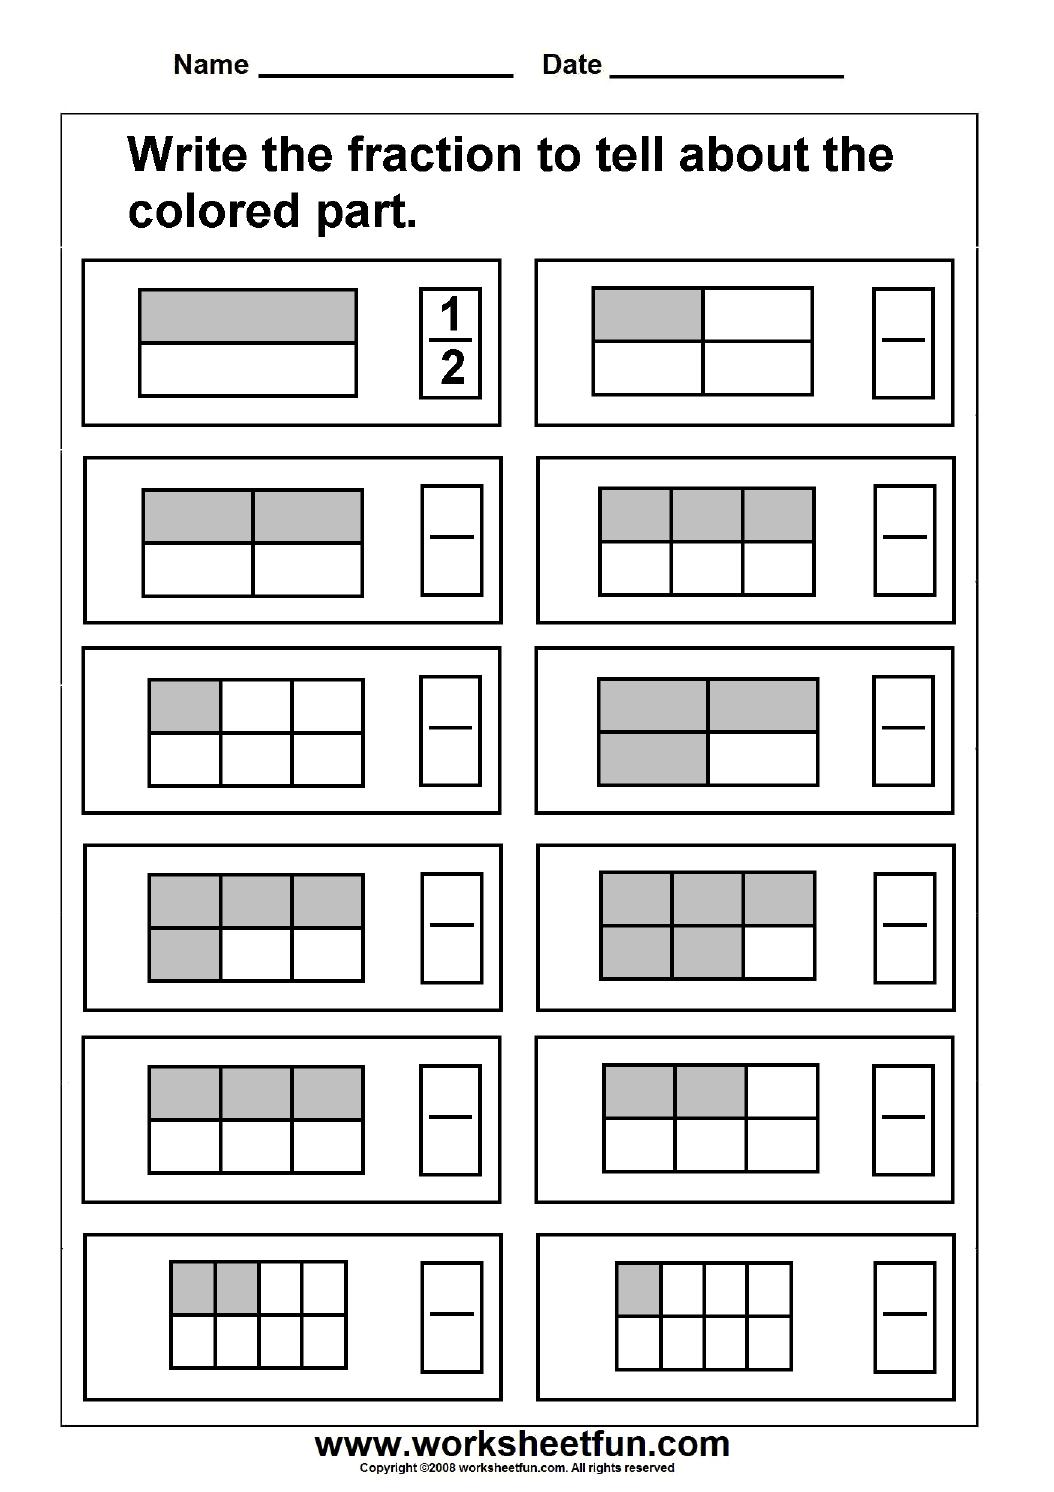 medium resolution of Fraction Worksheets For Grade 3 Site:pinterest.com To You. Fraction  Worksheets for Grade 3 - 3rd G…   Fractions worksheets